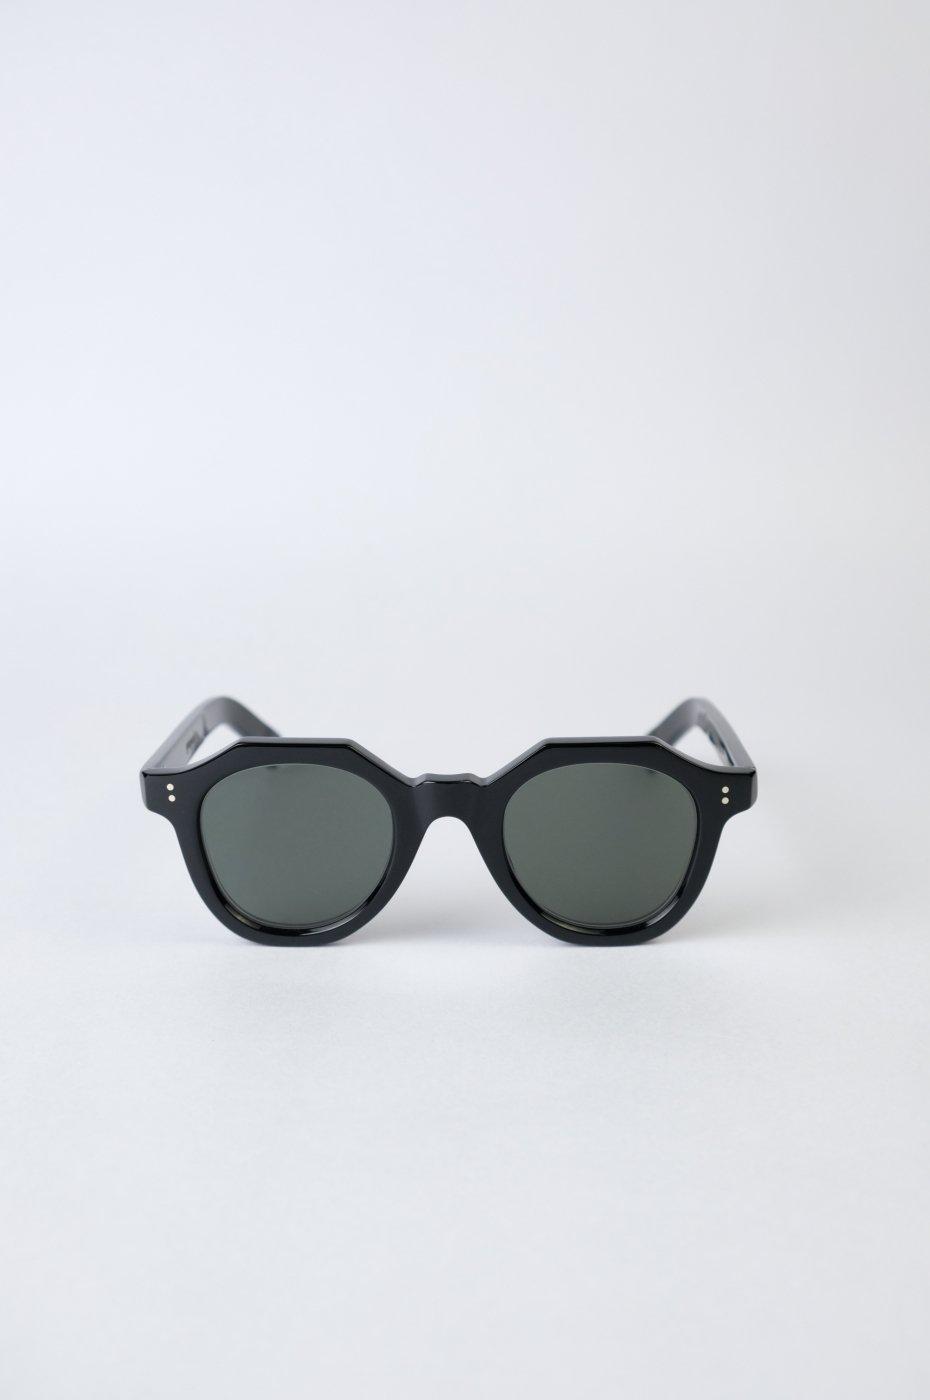 guépard ギュパール-gp-02- Noir-G15 Lens-